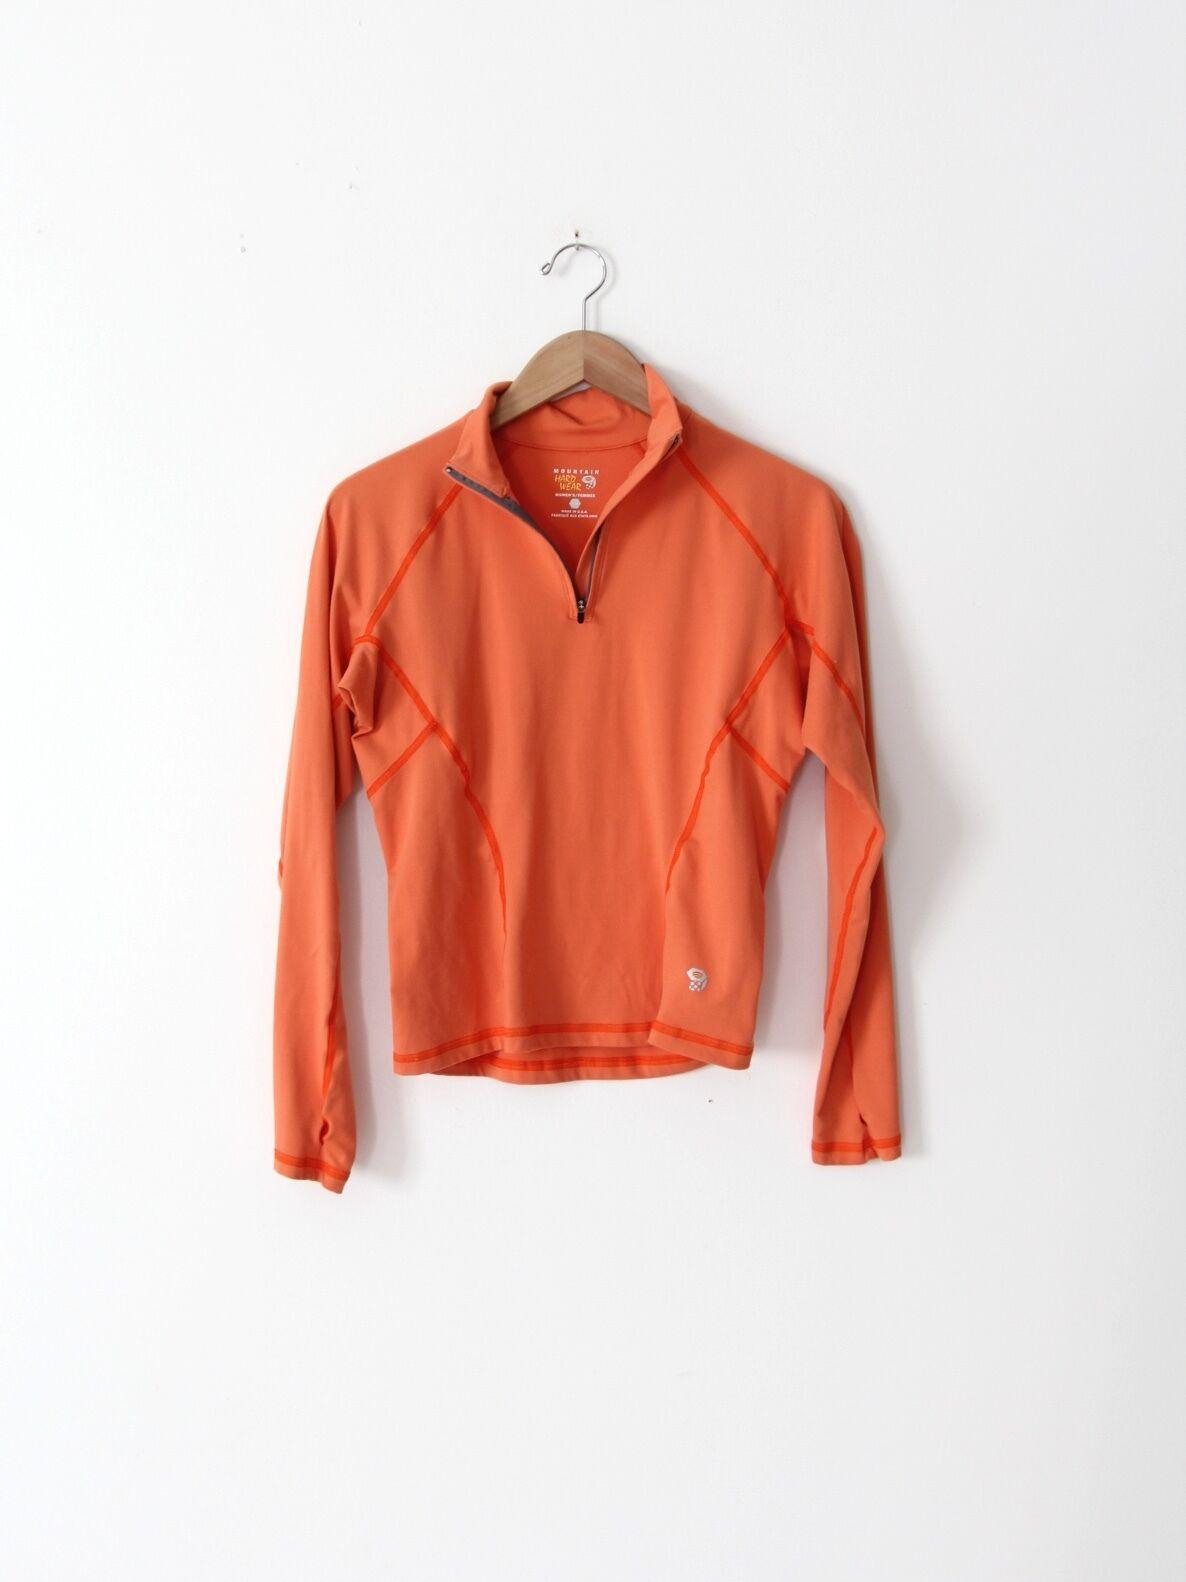 Mountain Hard Wear pullover orange activewear top hiking shirt